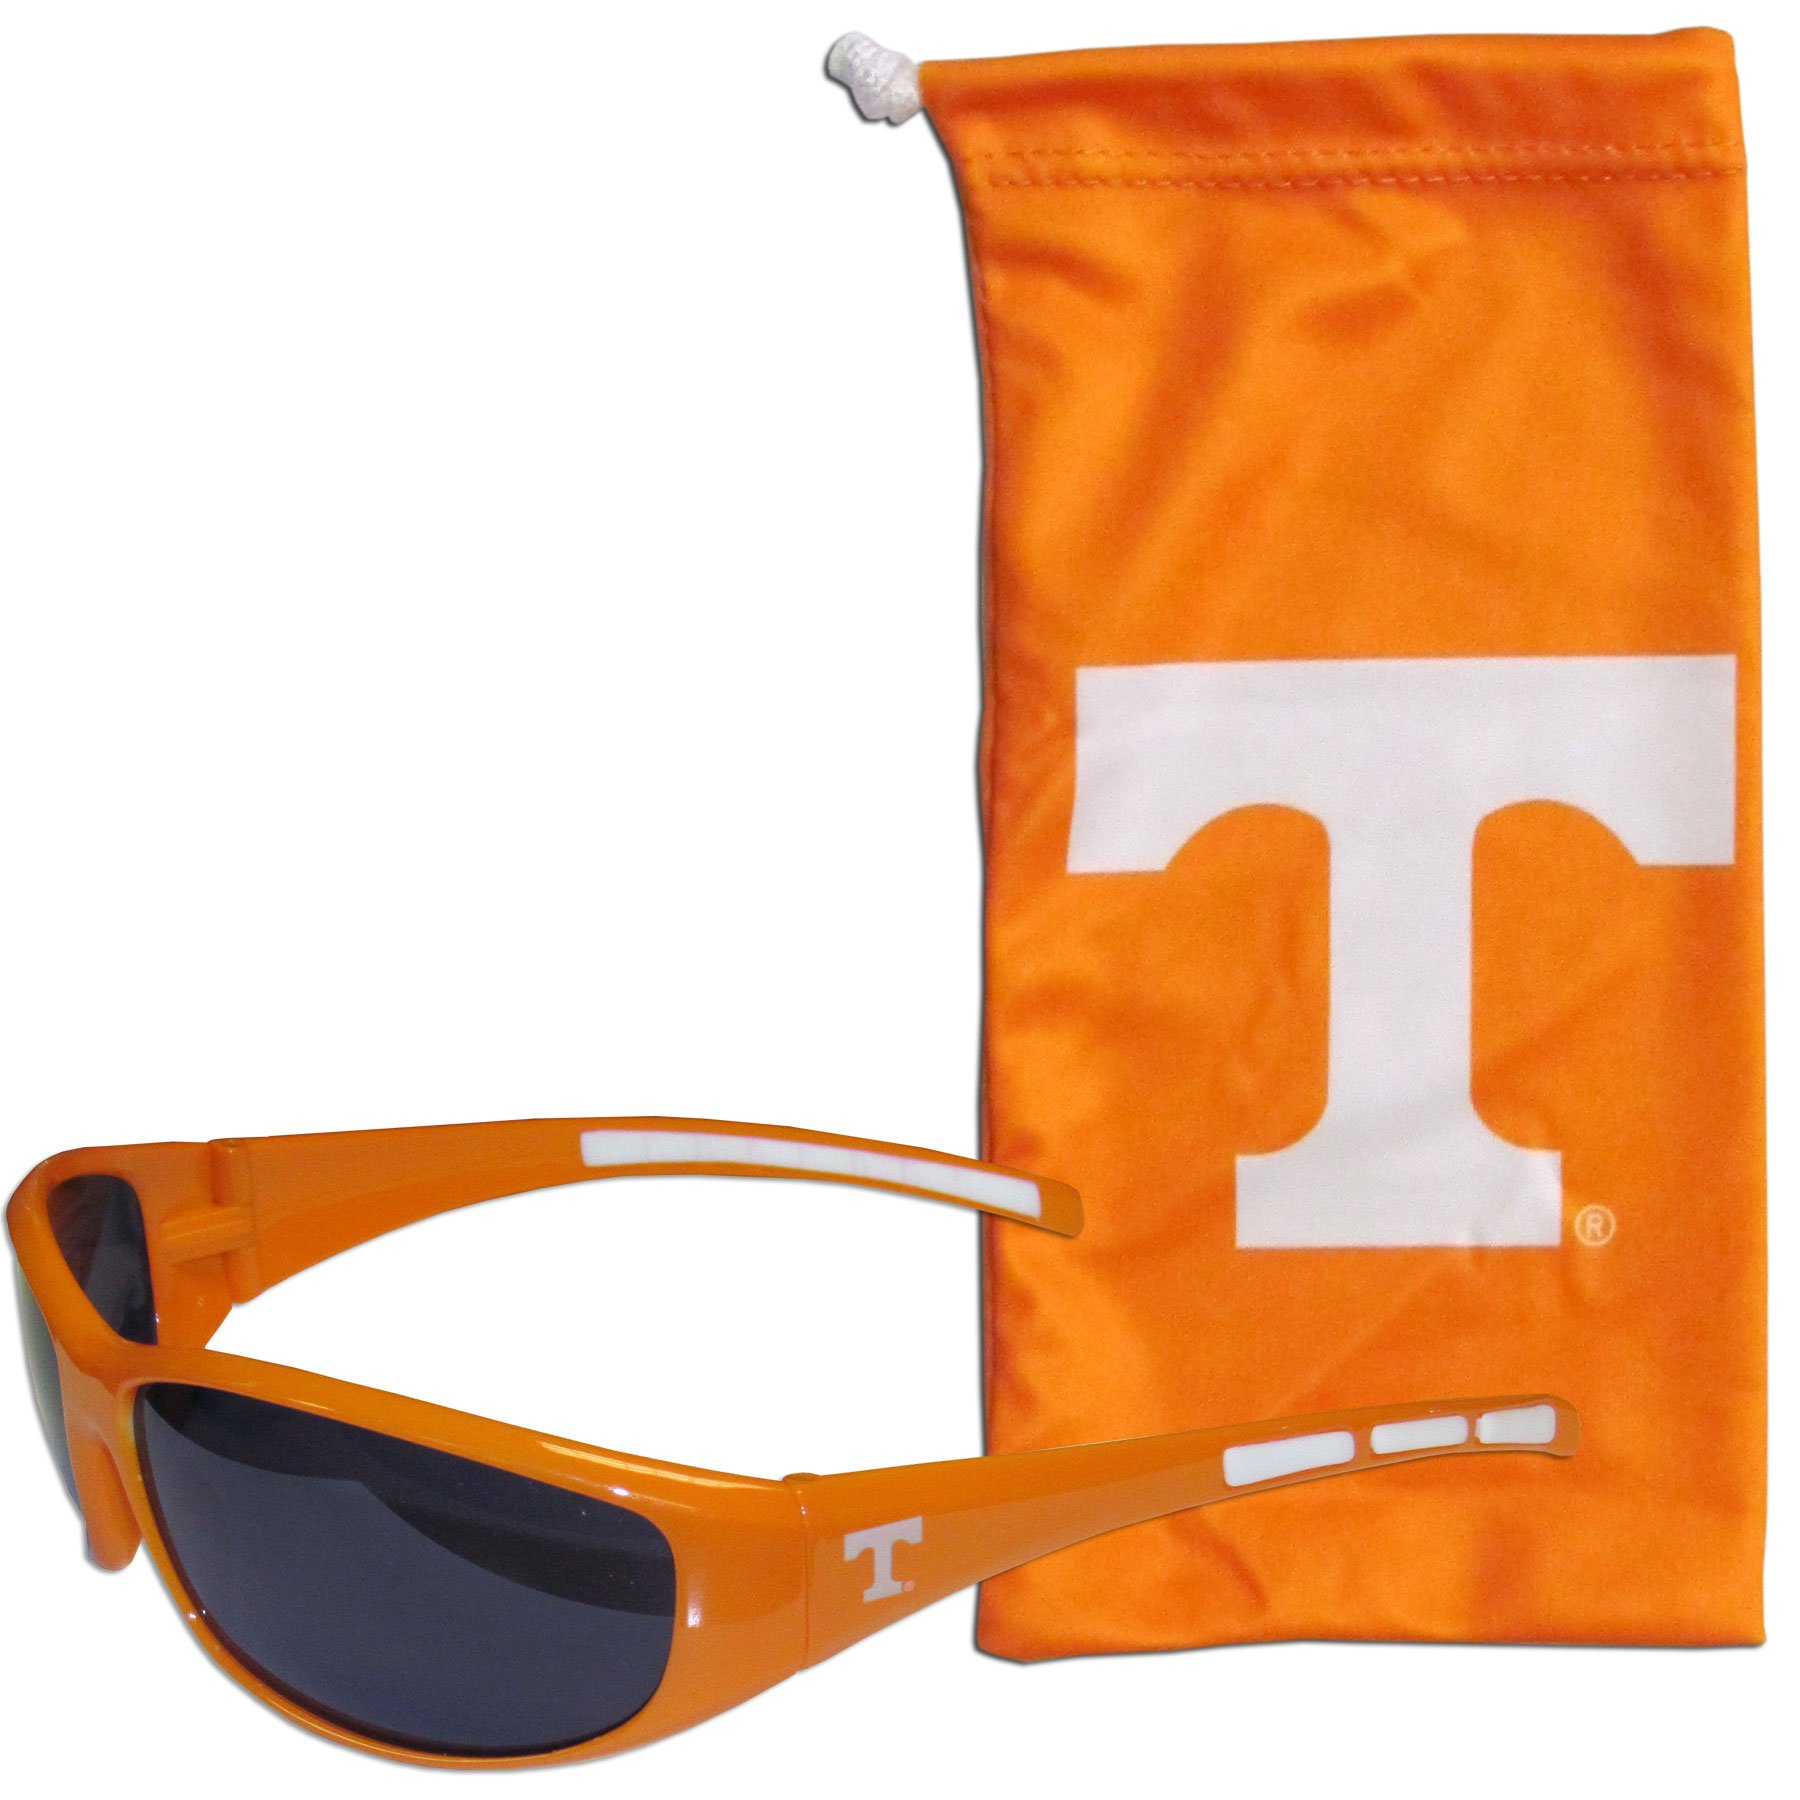 Siskiyou NCAA Tennessee Volunteers Adult Sunglass and Bag Set, Orange by Siskiyou (Image #1)